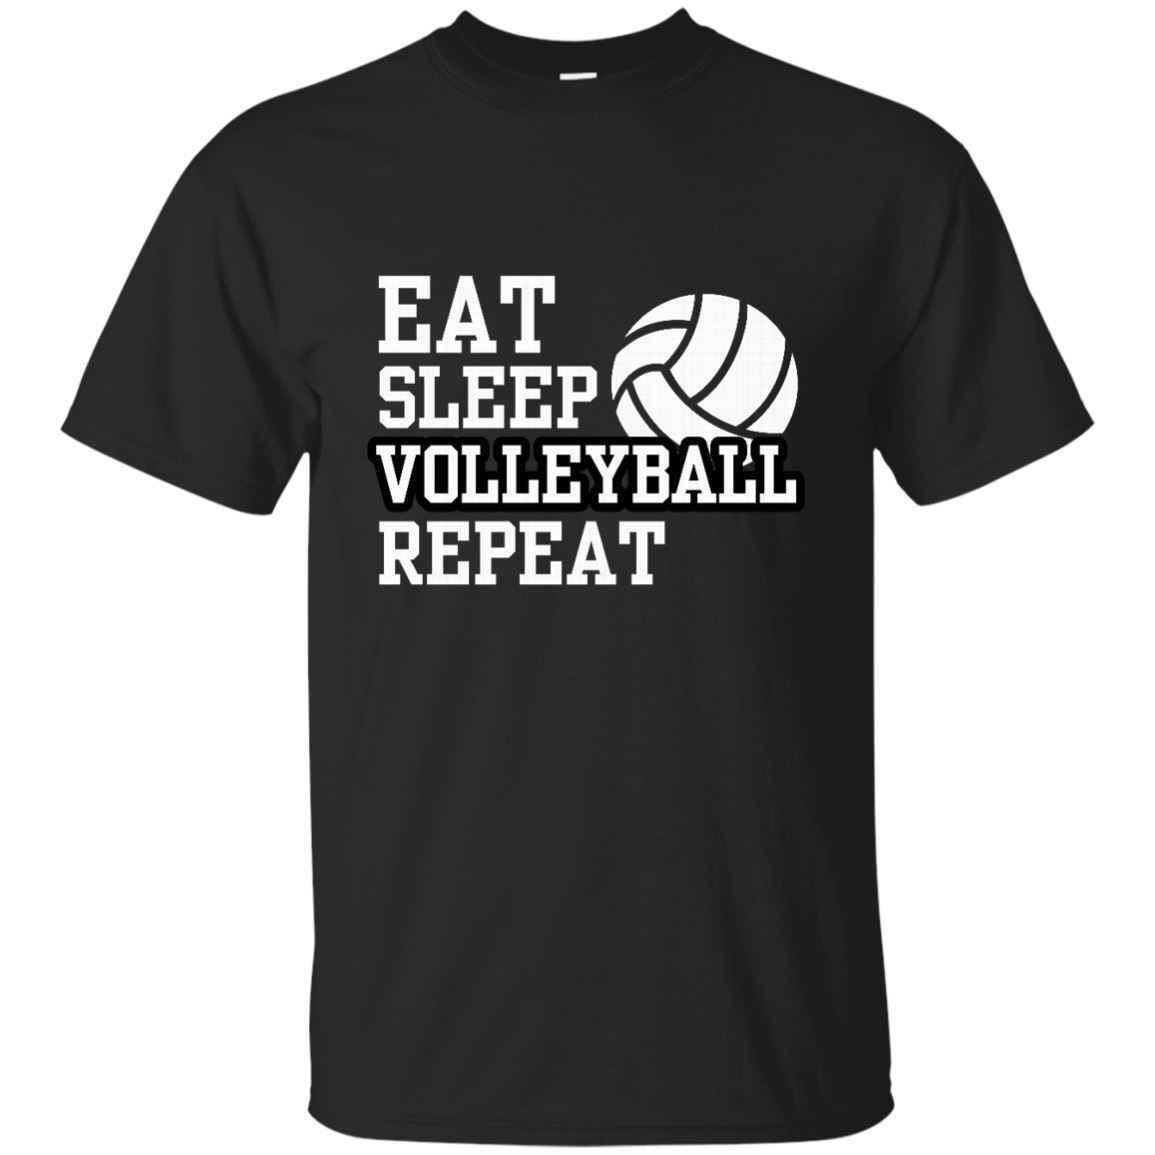 Nuevo comer dormir voleibol repetir, camiseta Unisex-negro, camiseta azul marino para hombres, camiseta para hombre Xxxtentacion Harajuku camiseta para hombre